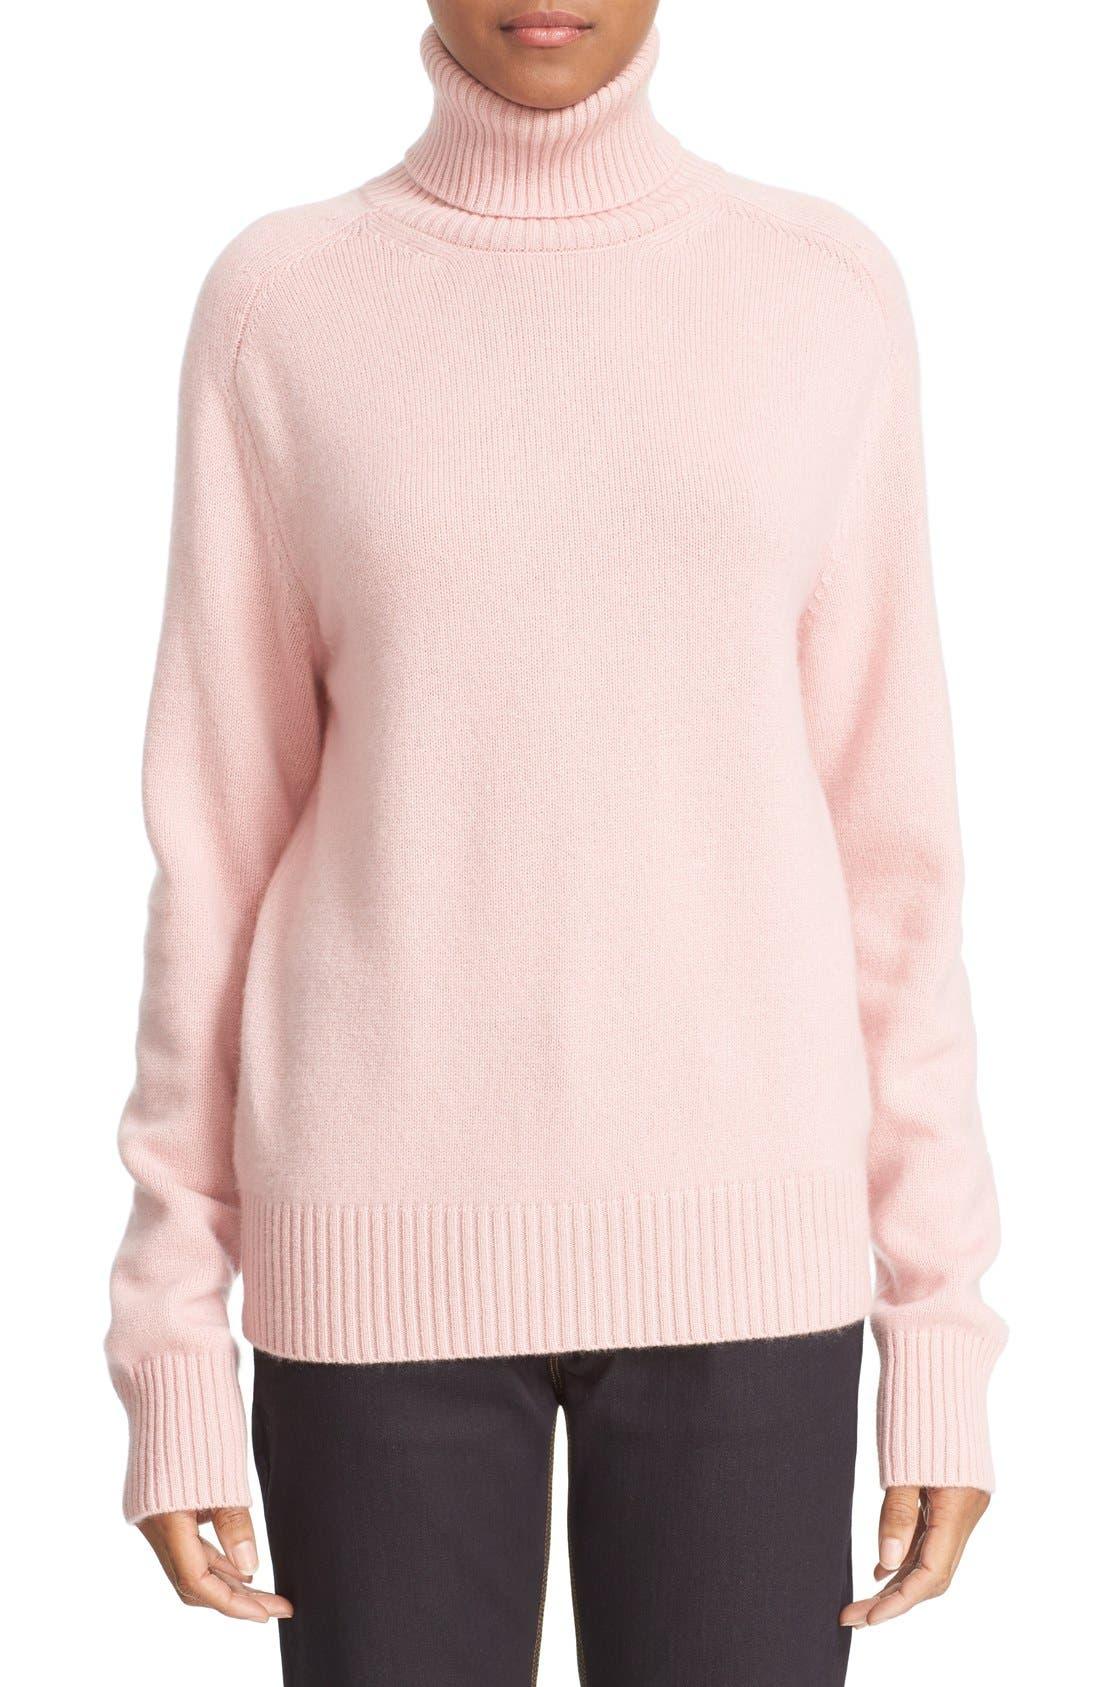 Alternate Image 1 Selected - Tomas Maier Cashmere Turtleneck Sweater